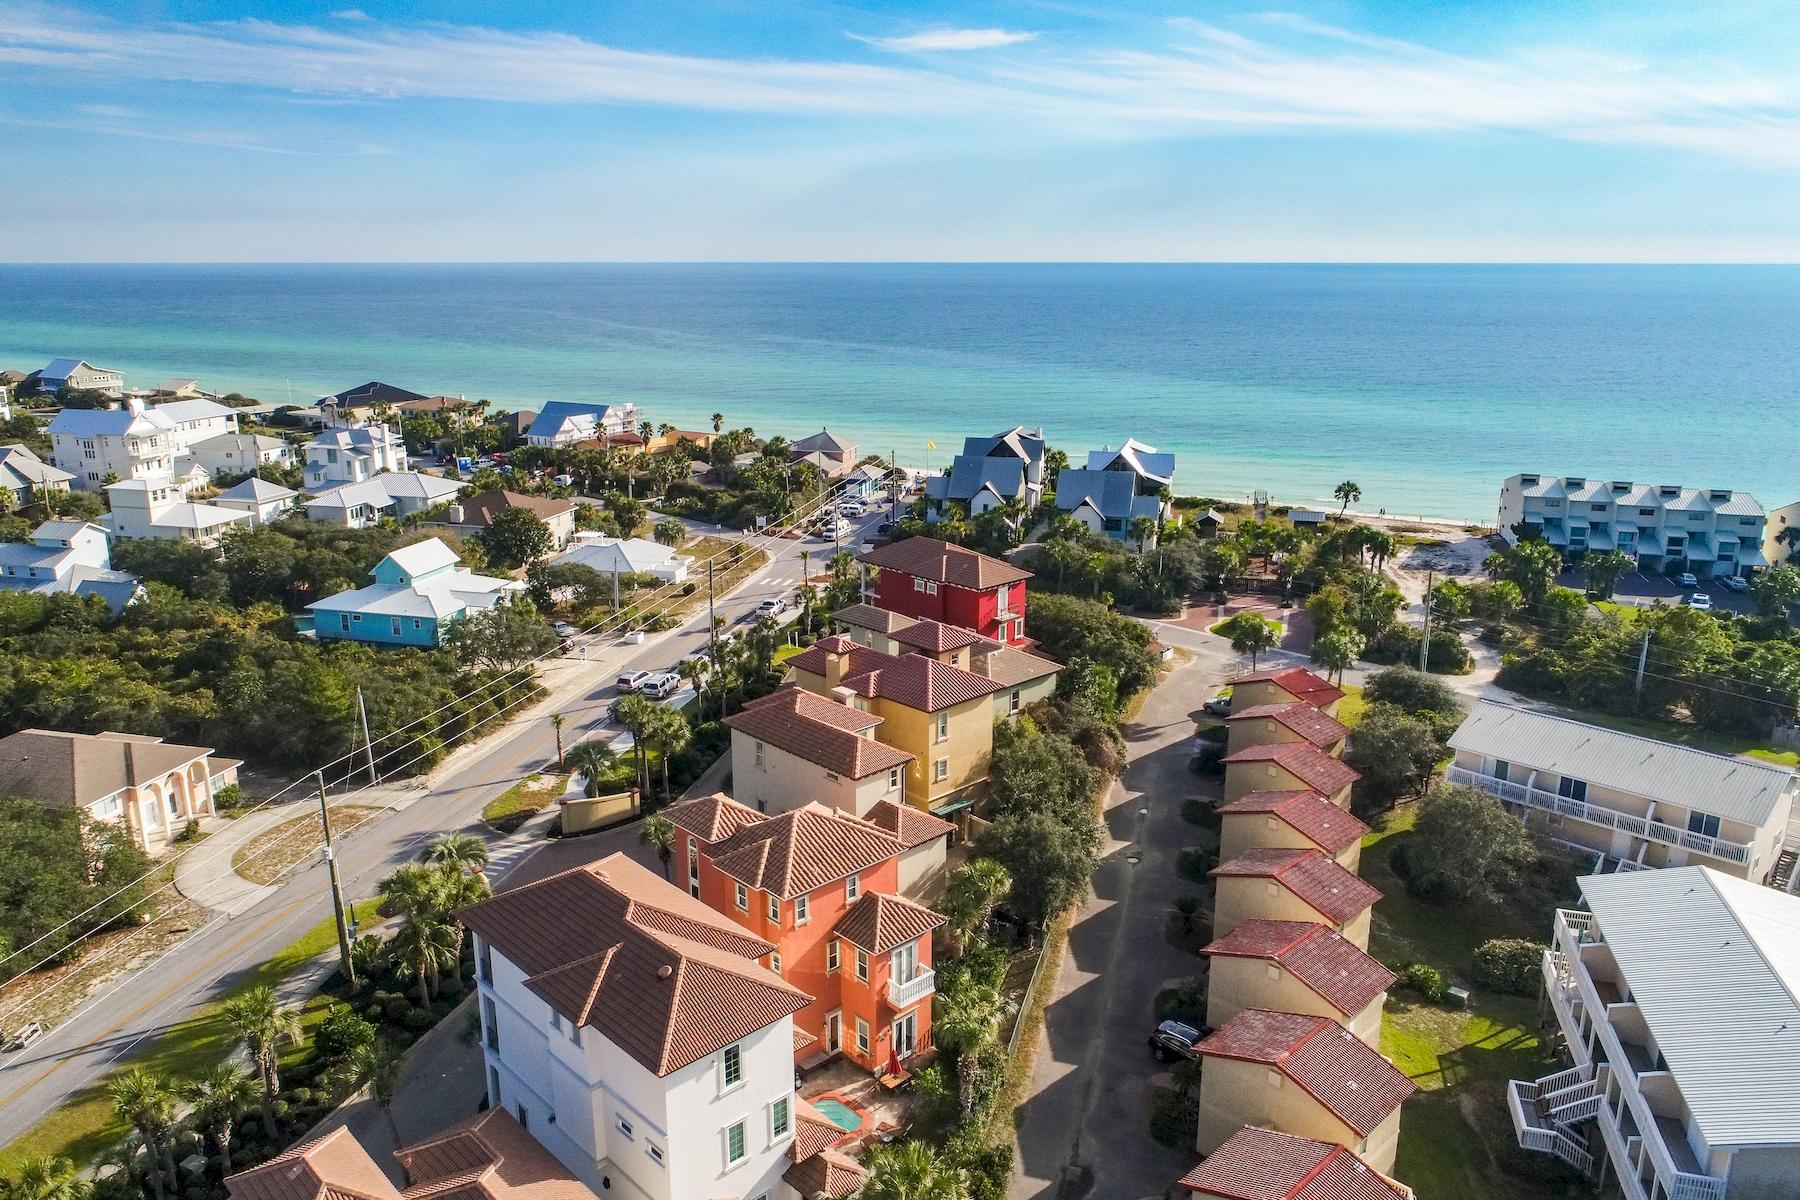 Частный односемейный дом для того Продажа на Mediterranean Style Home a Short Walk to the Beach 2196 S Hwy 83, Santa Rosa Beach, Флорида, 32459 Соединенные Штаты